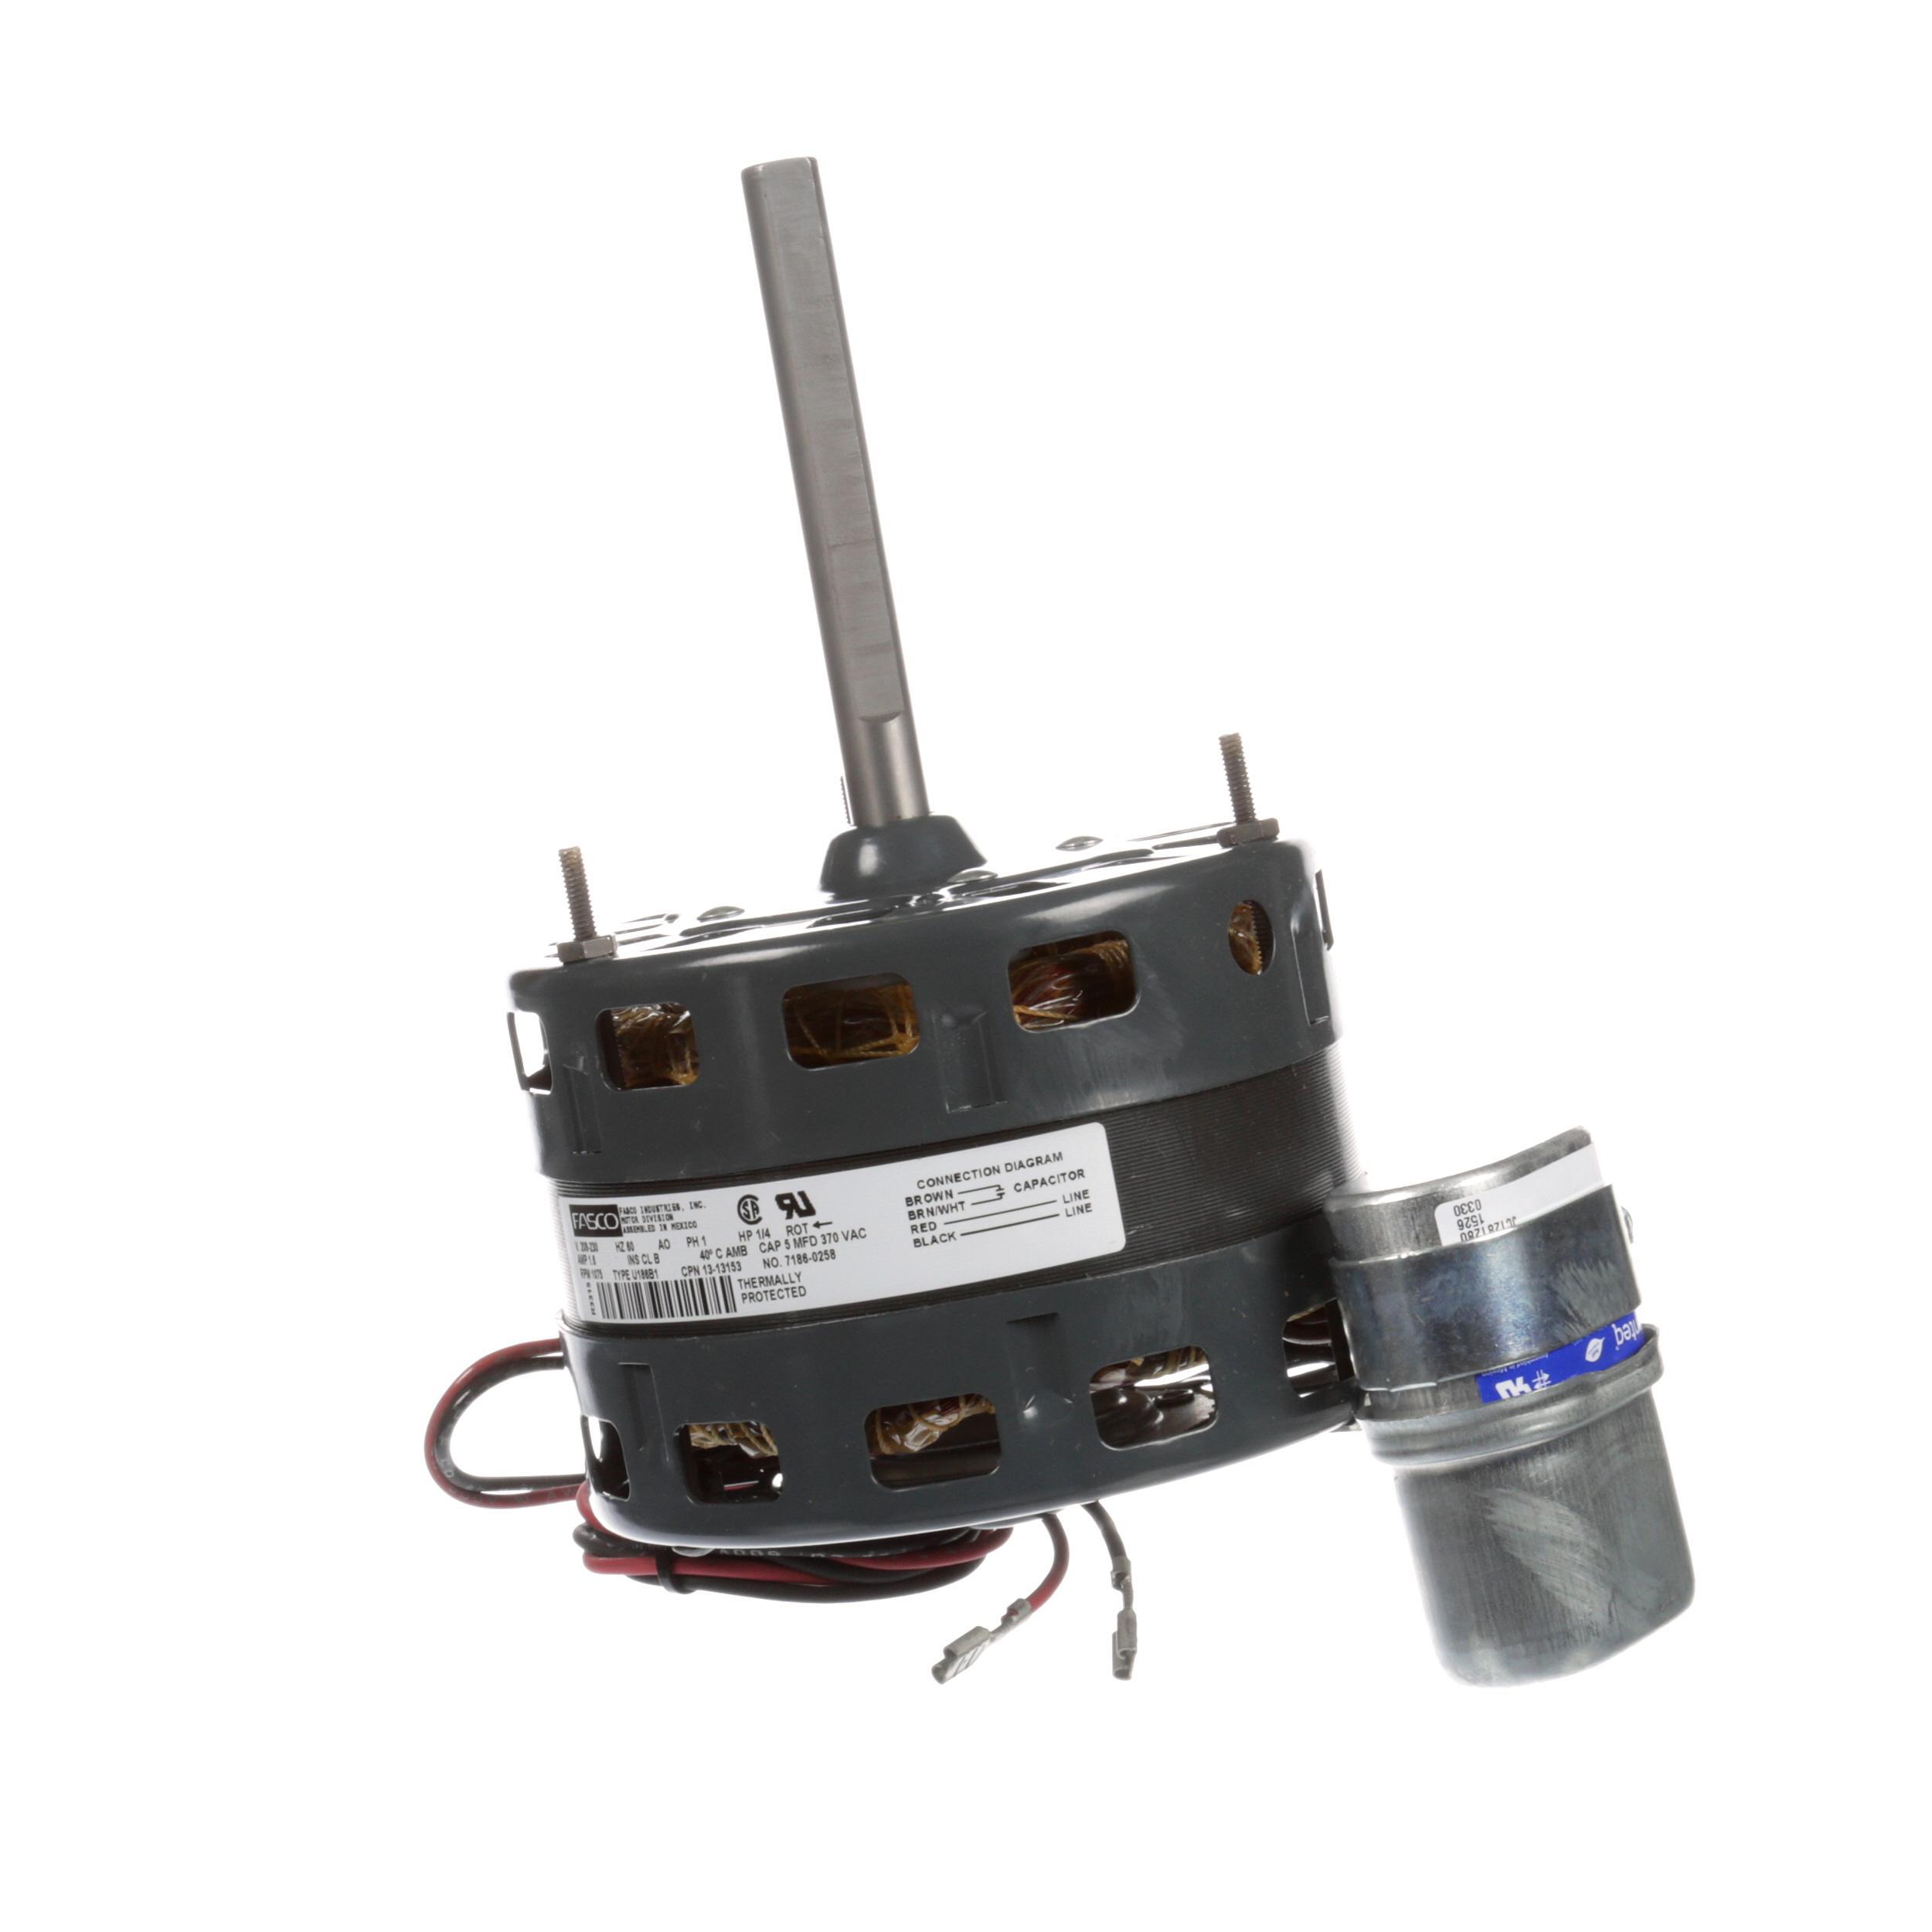 Master Bilt Condenser Fan Motor 7186 025 Part 13 13153 Black Magic Wiring Diagram